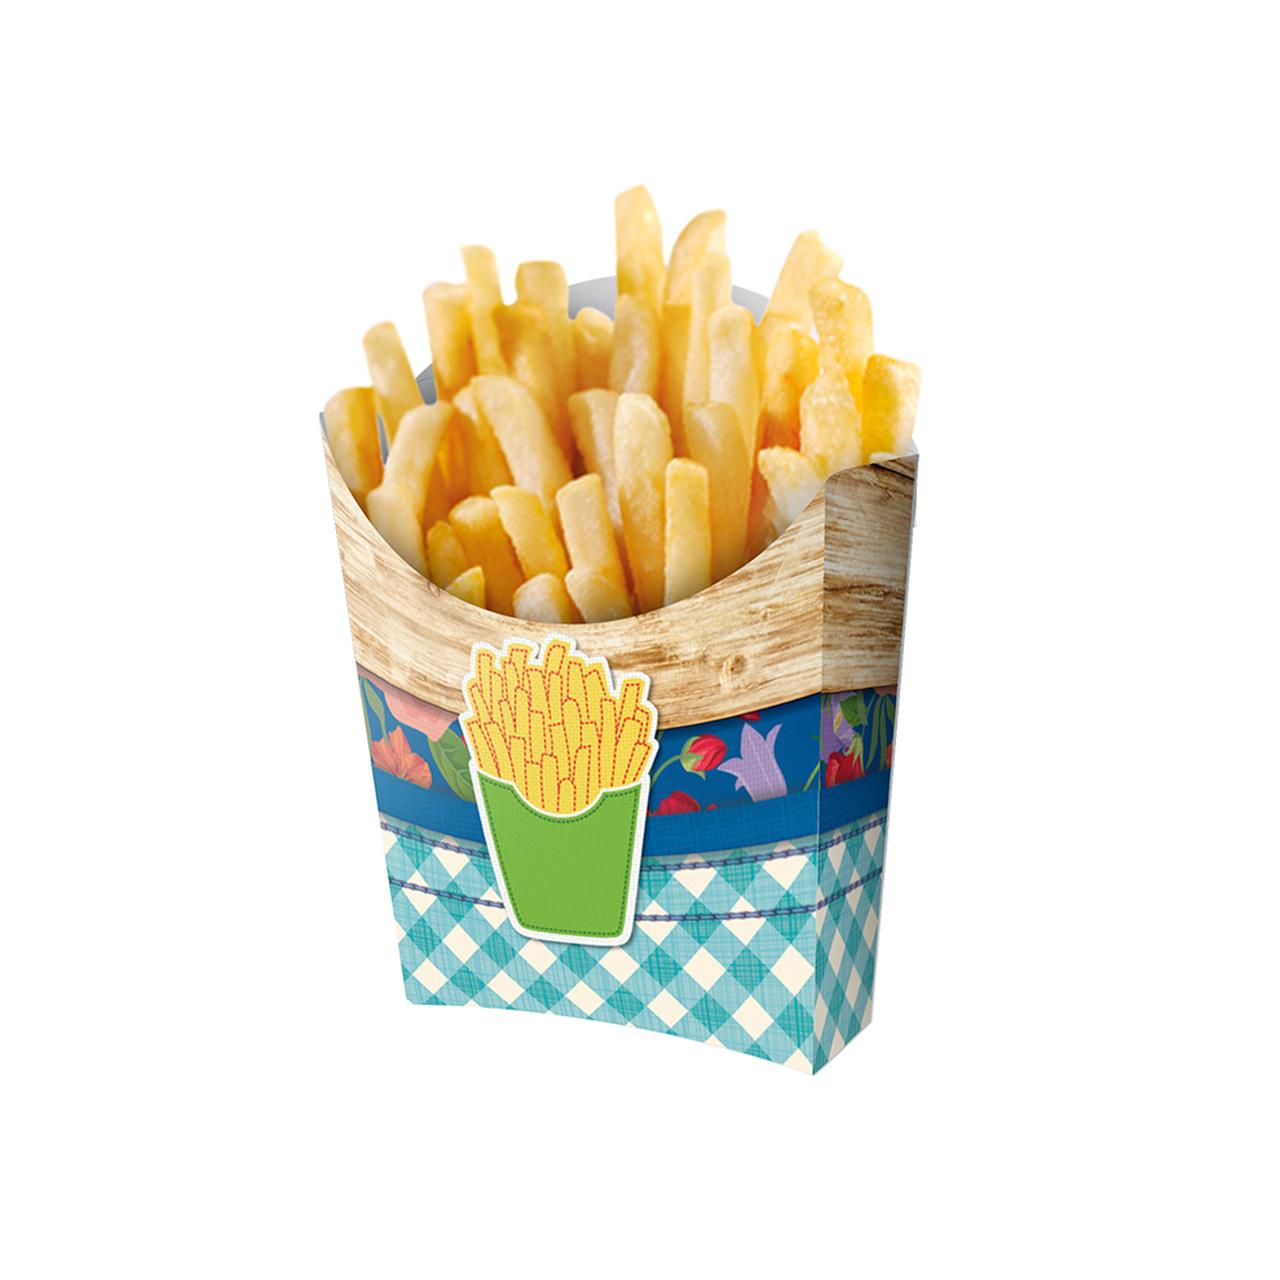 Caixa Para Batata Frita Junino-08 Unidades